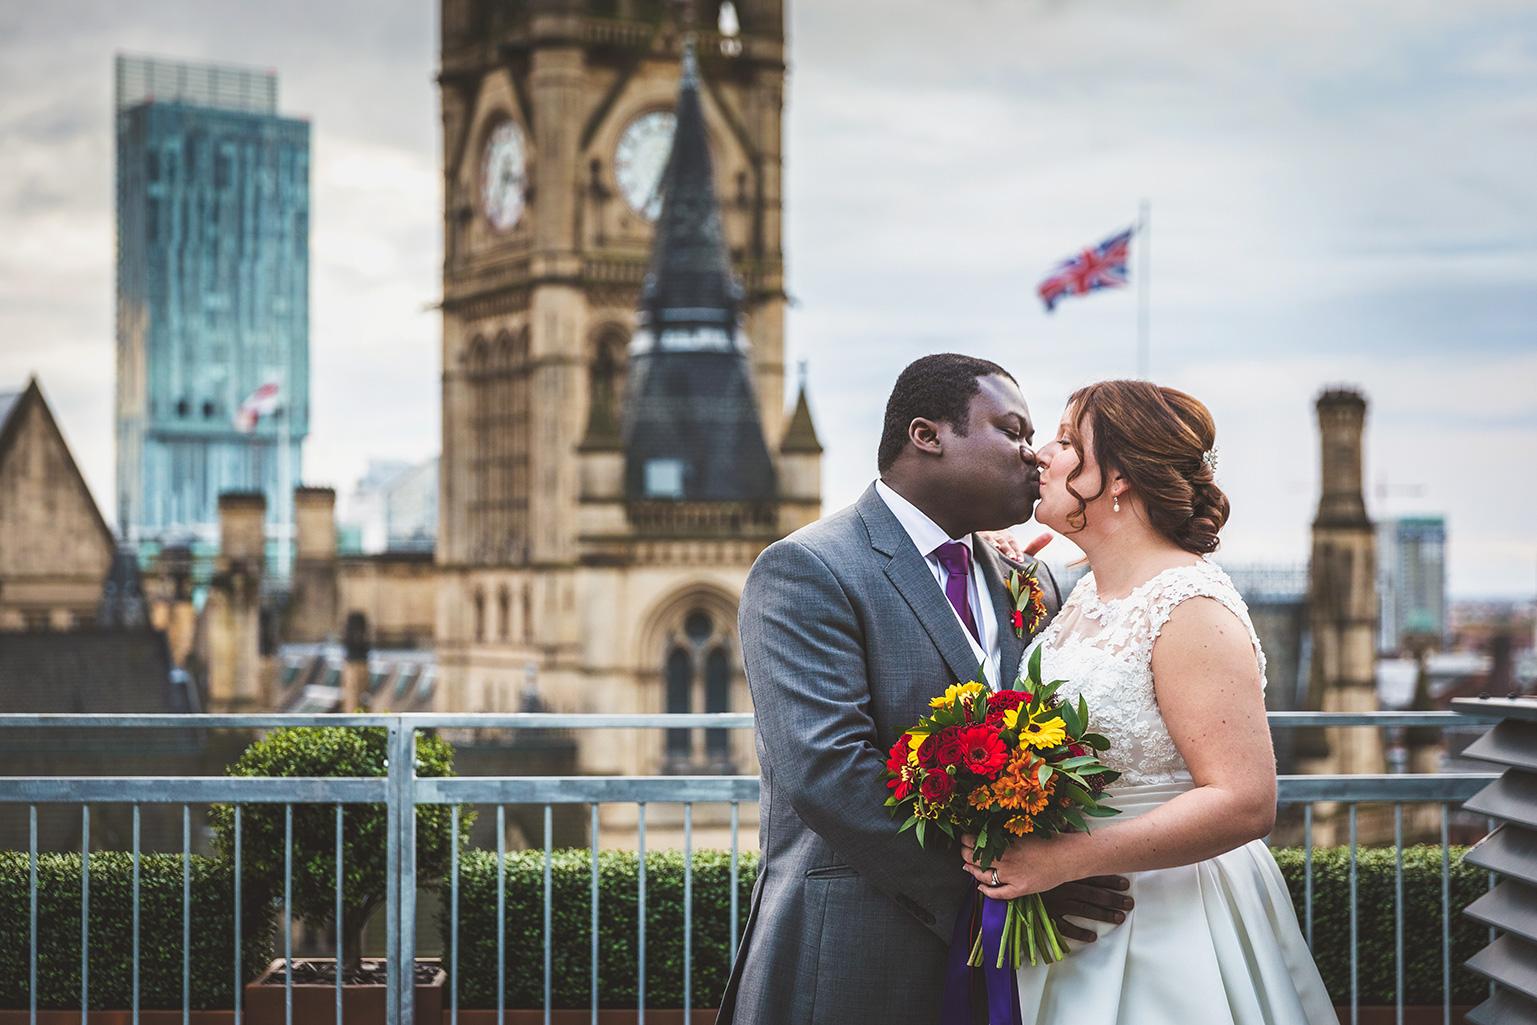 King Street Townhouse wedding